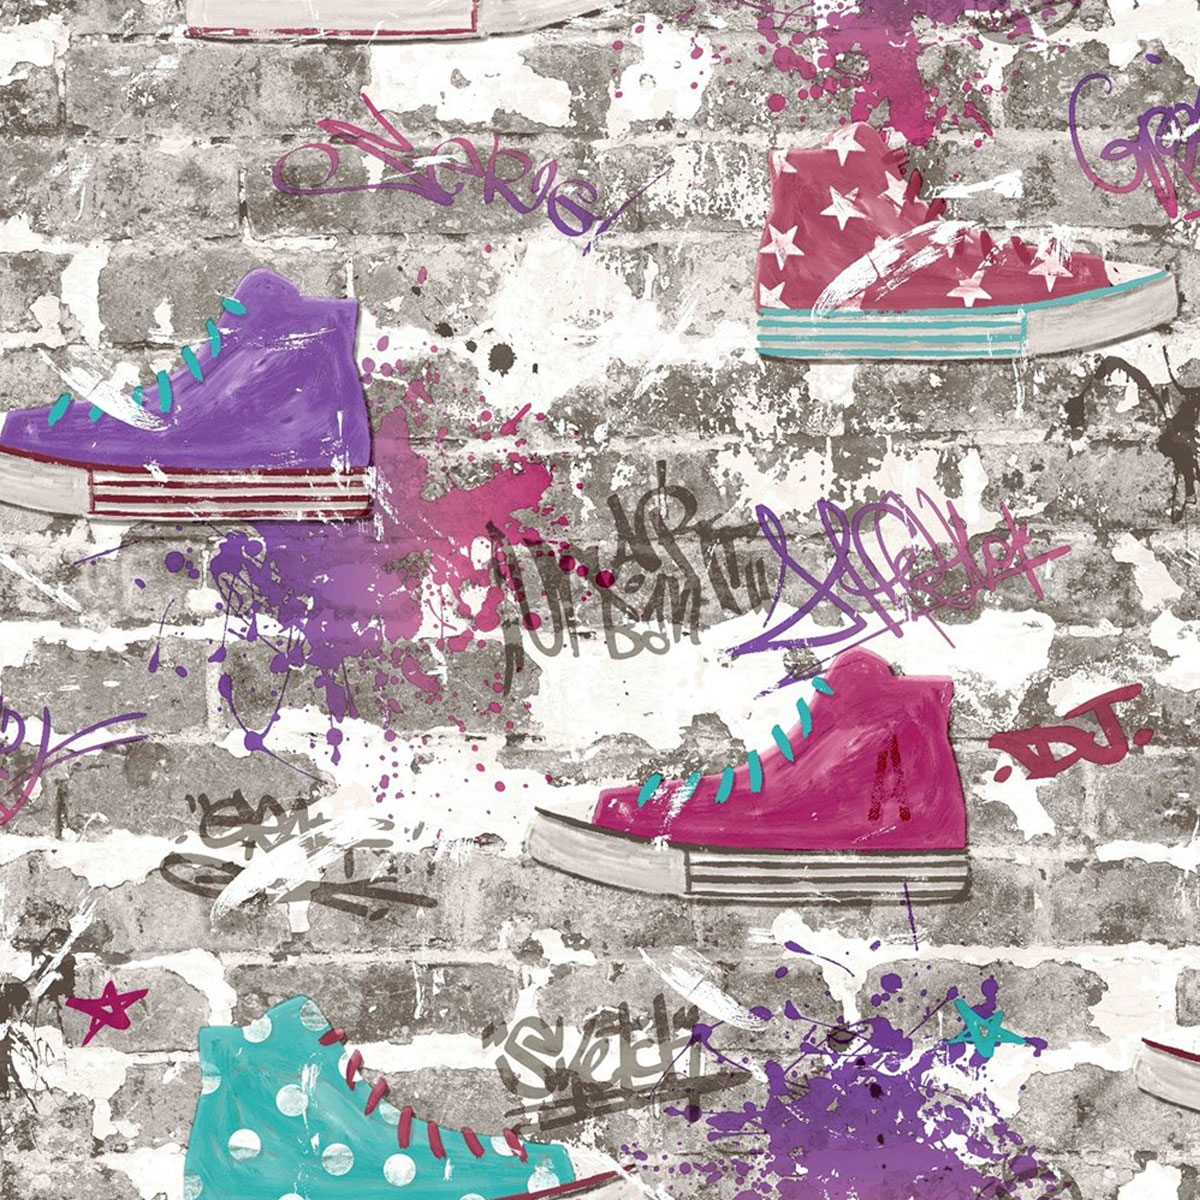 Graffiti Style Wallpaper 3D Brick Wall Urban Street Sneakers